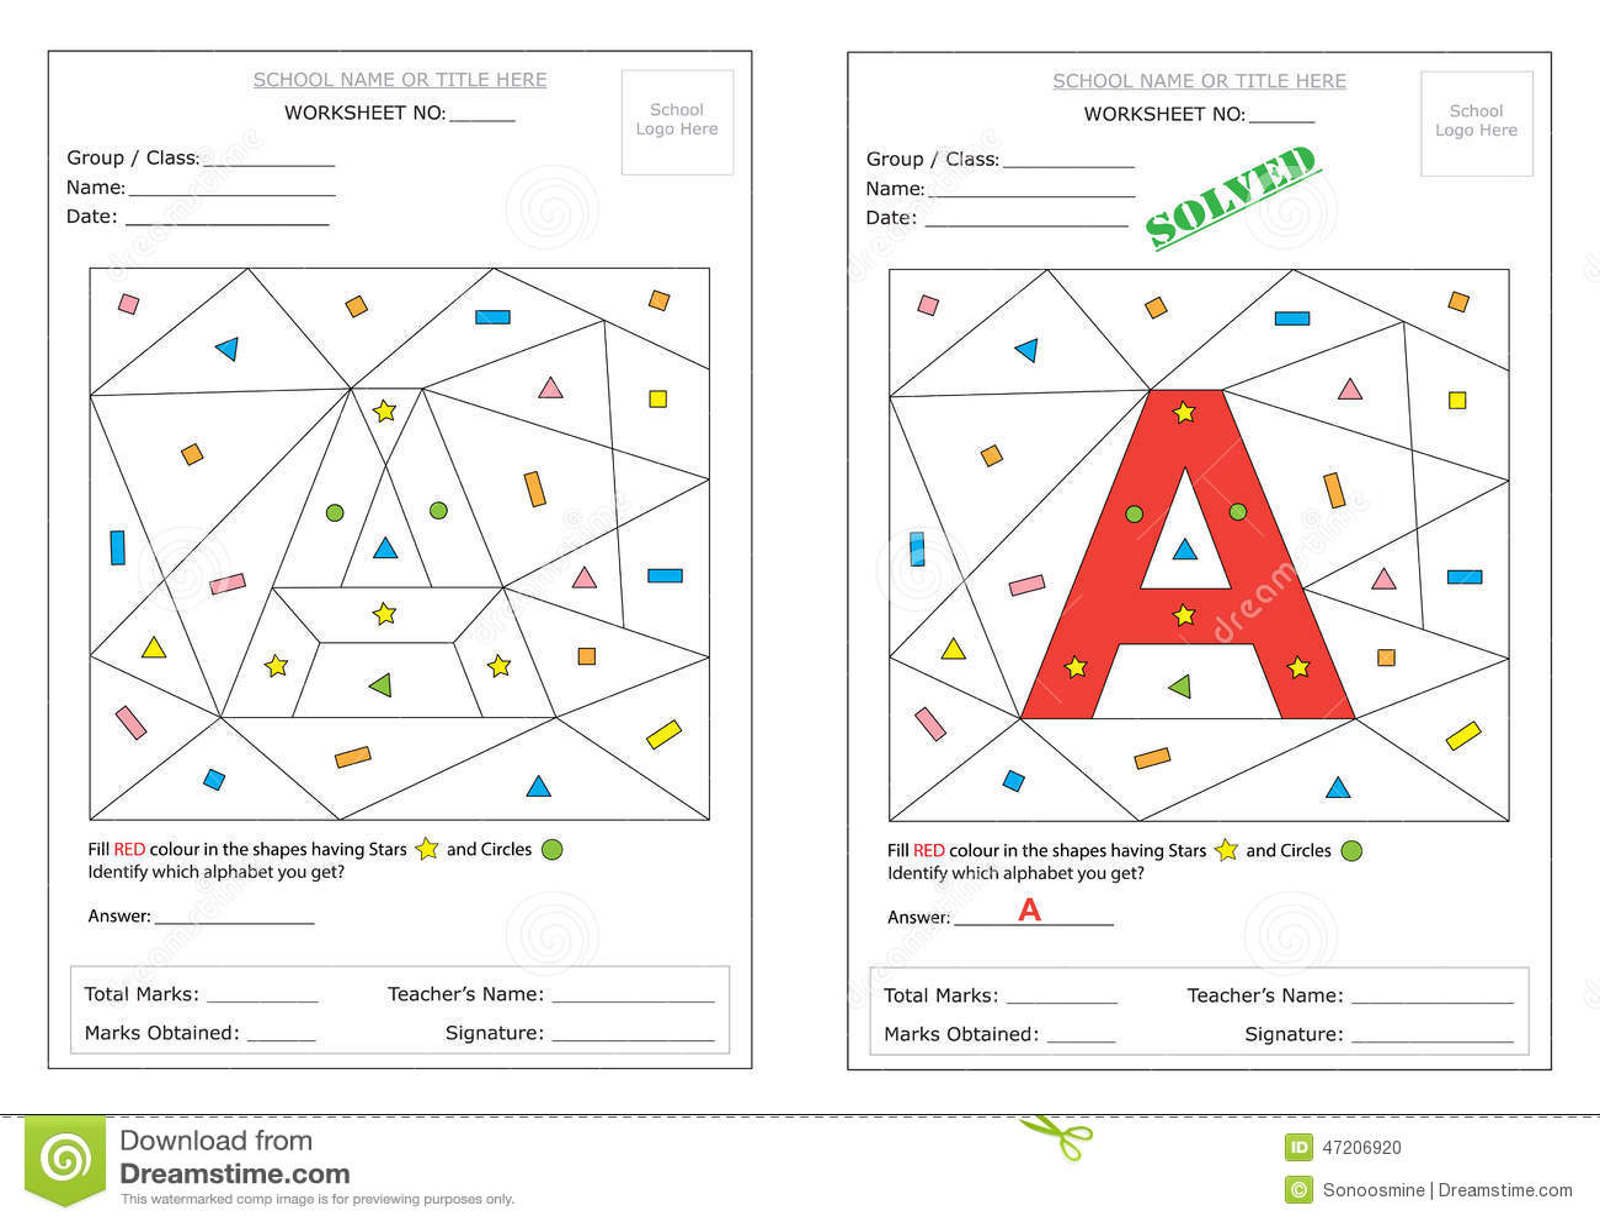 Arbeitsblatt Alphabet Italien : Arbeitsblatt identifizieren sie alphabet vektor